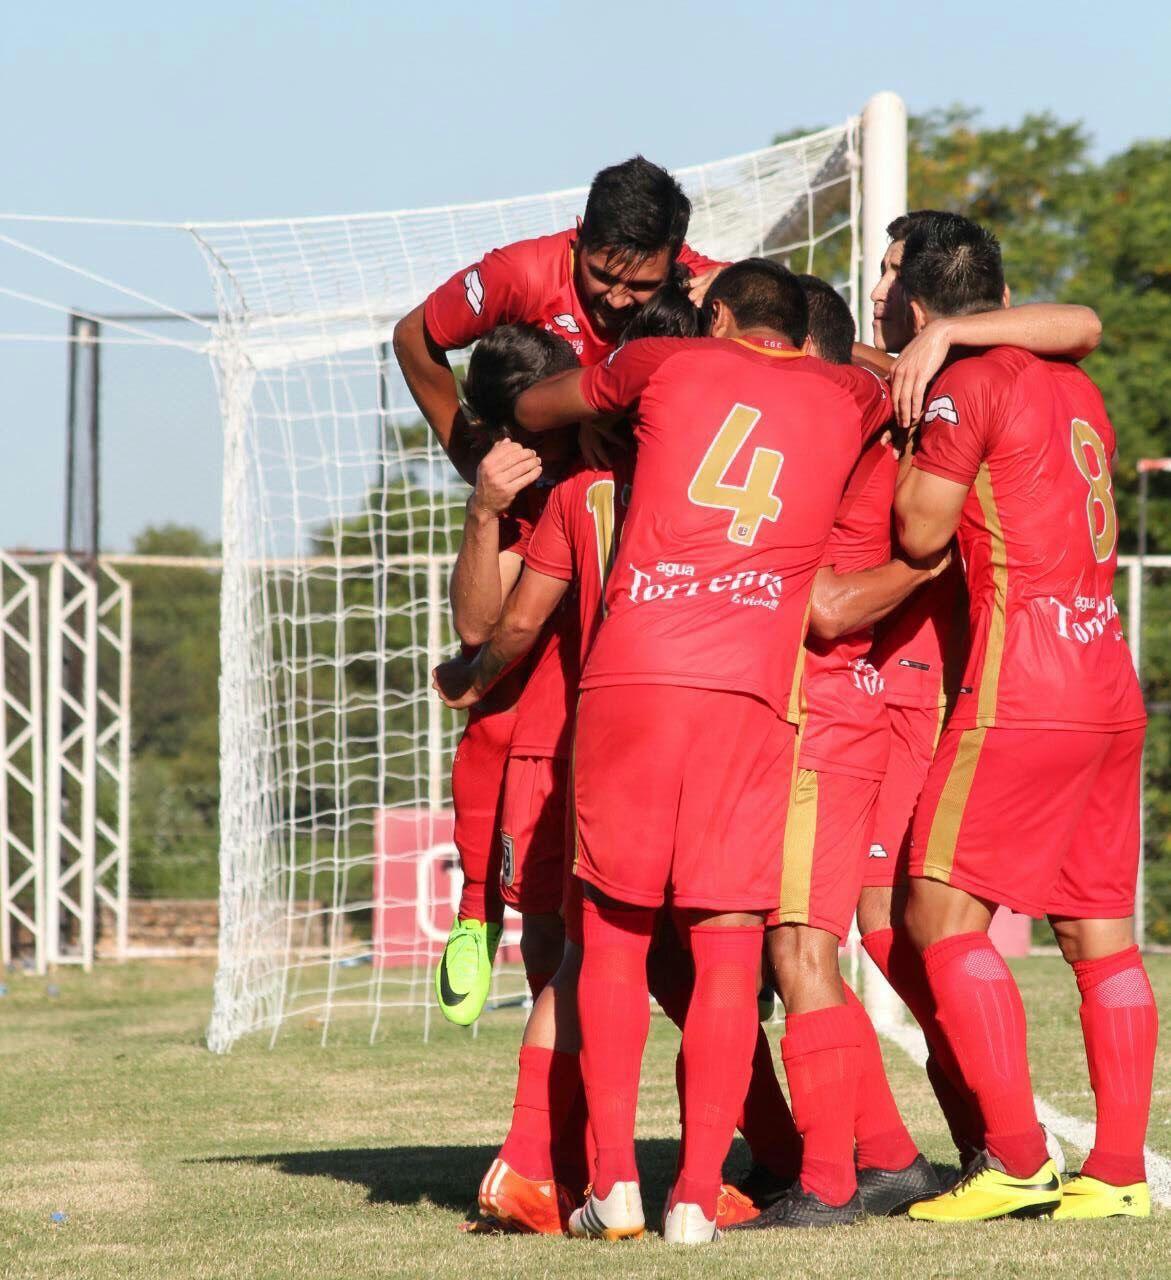 Futbolistas reclaman a la dirigencia Matarife. Foto: APF